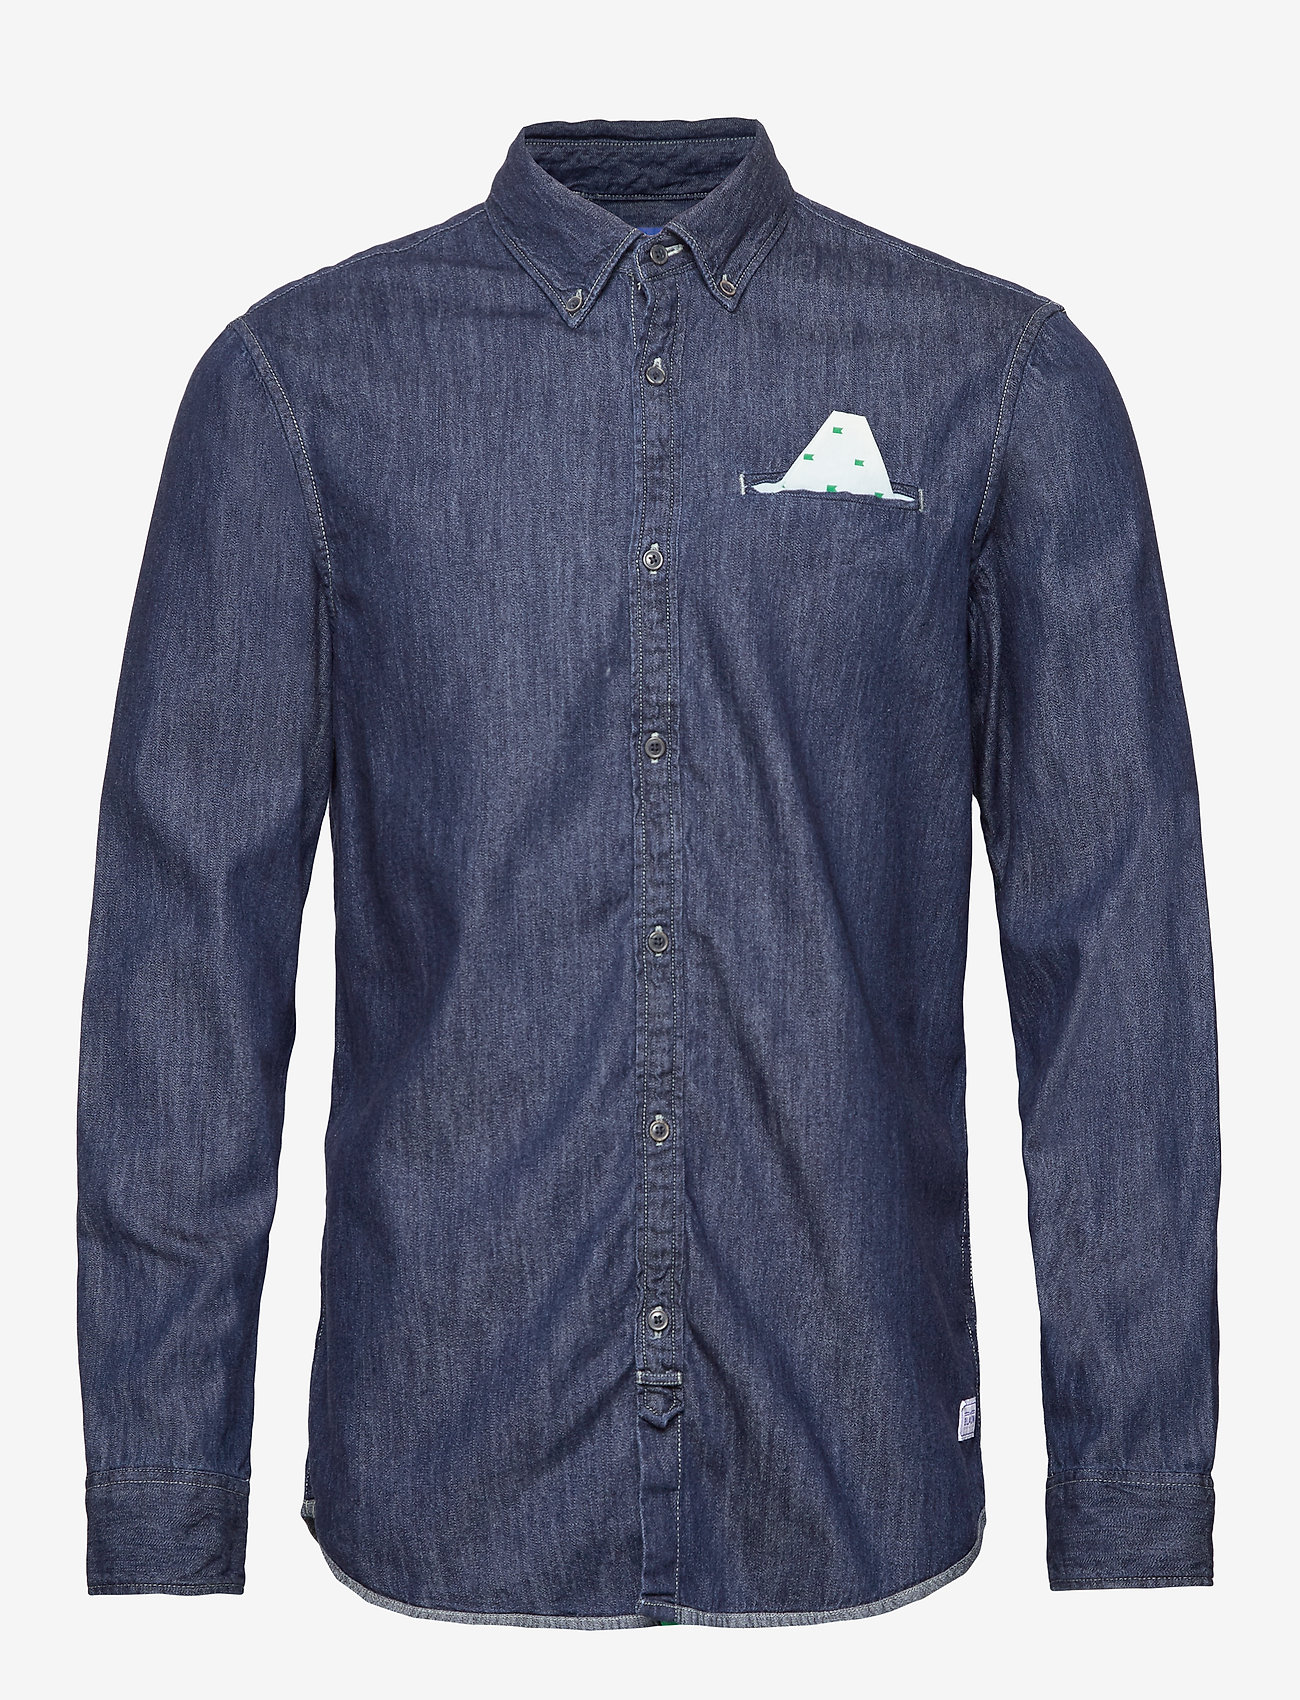 Scotch & Soda - Ams Blauw regular fit denim shirt with pochet pocket detail - podstawowe koszulki - indigo blue - 0